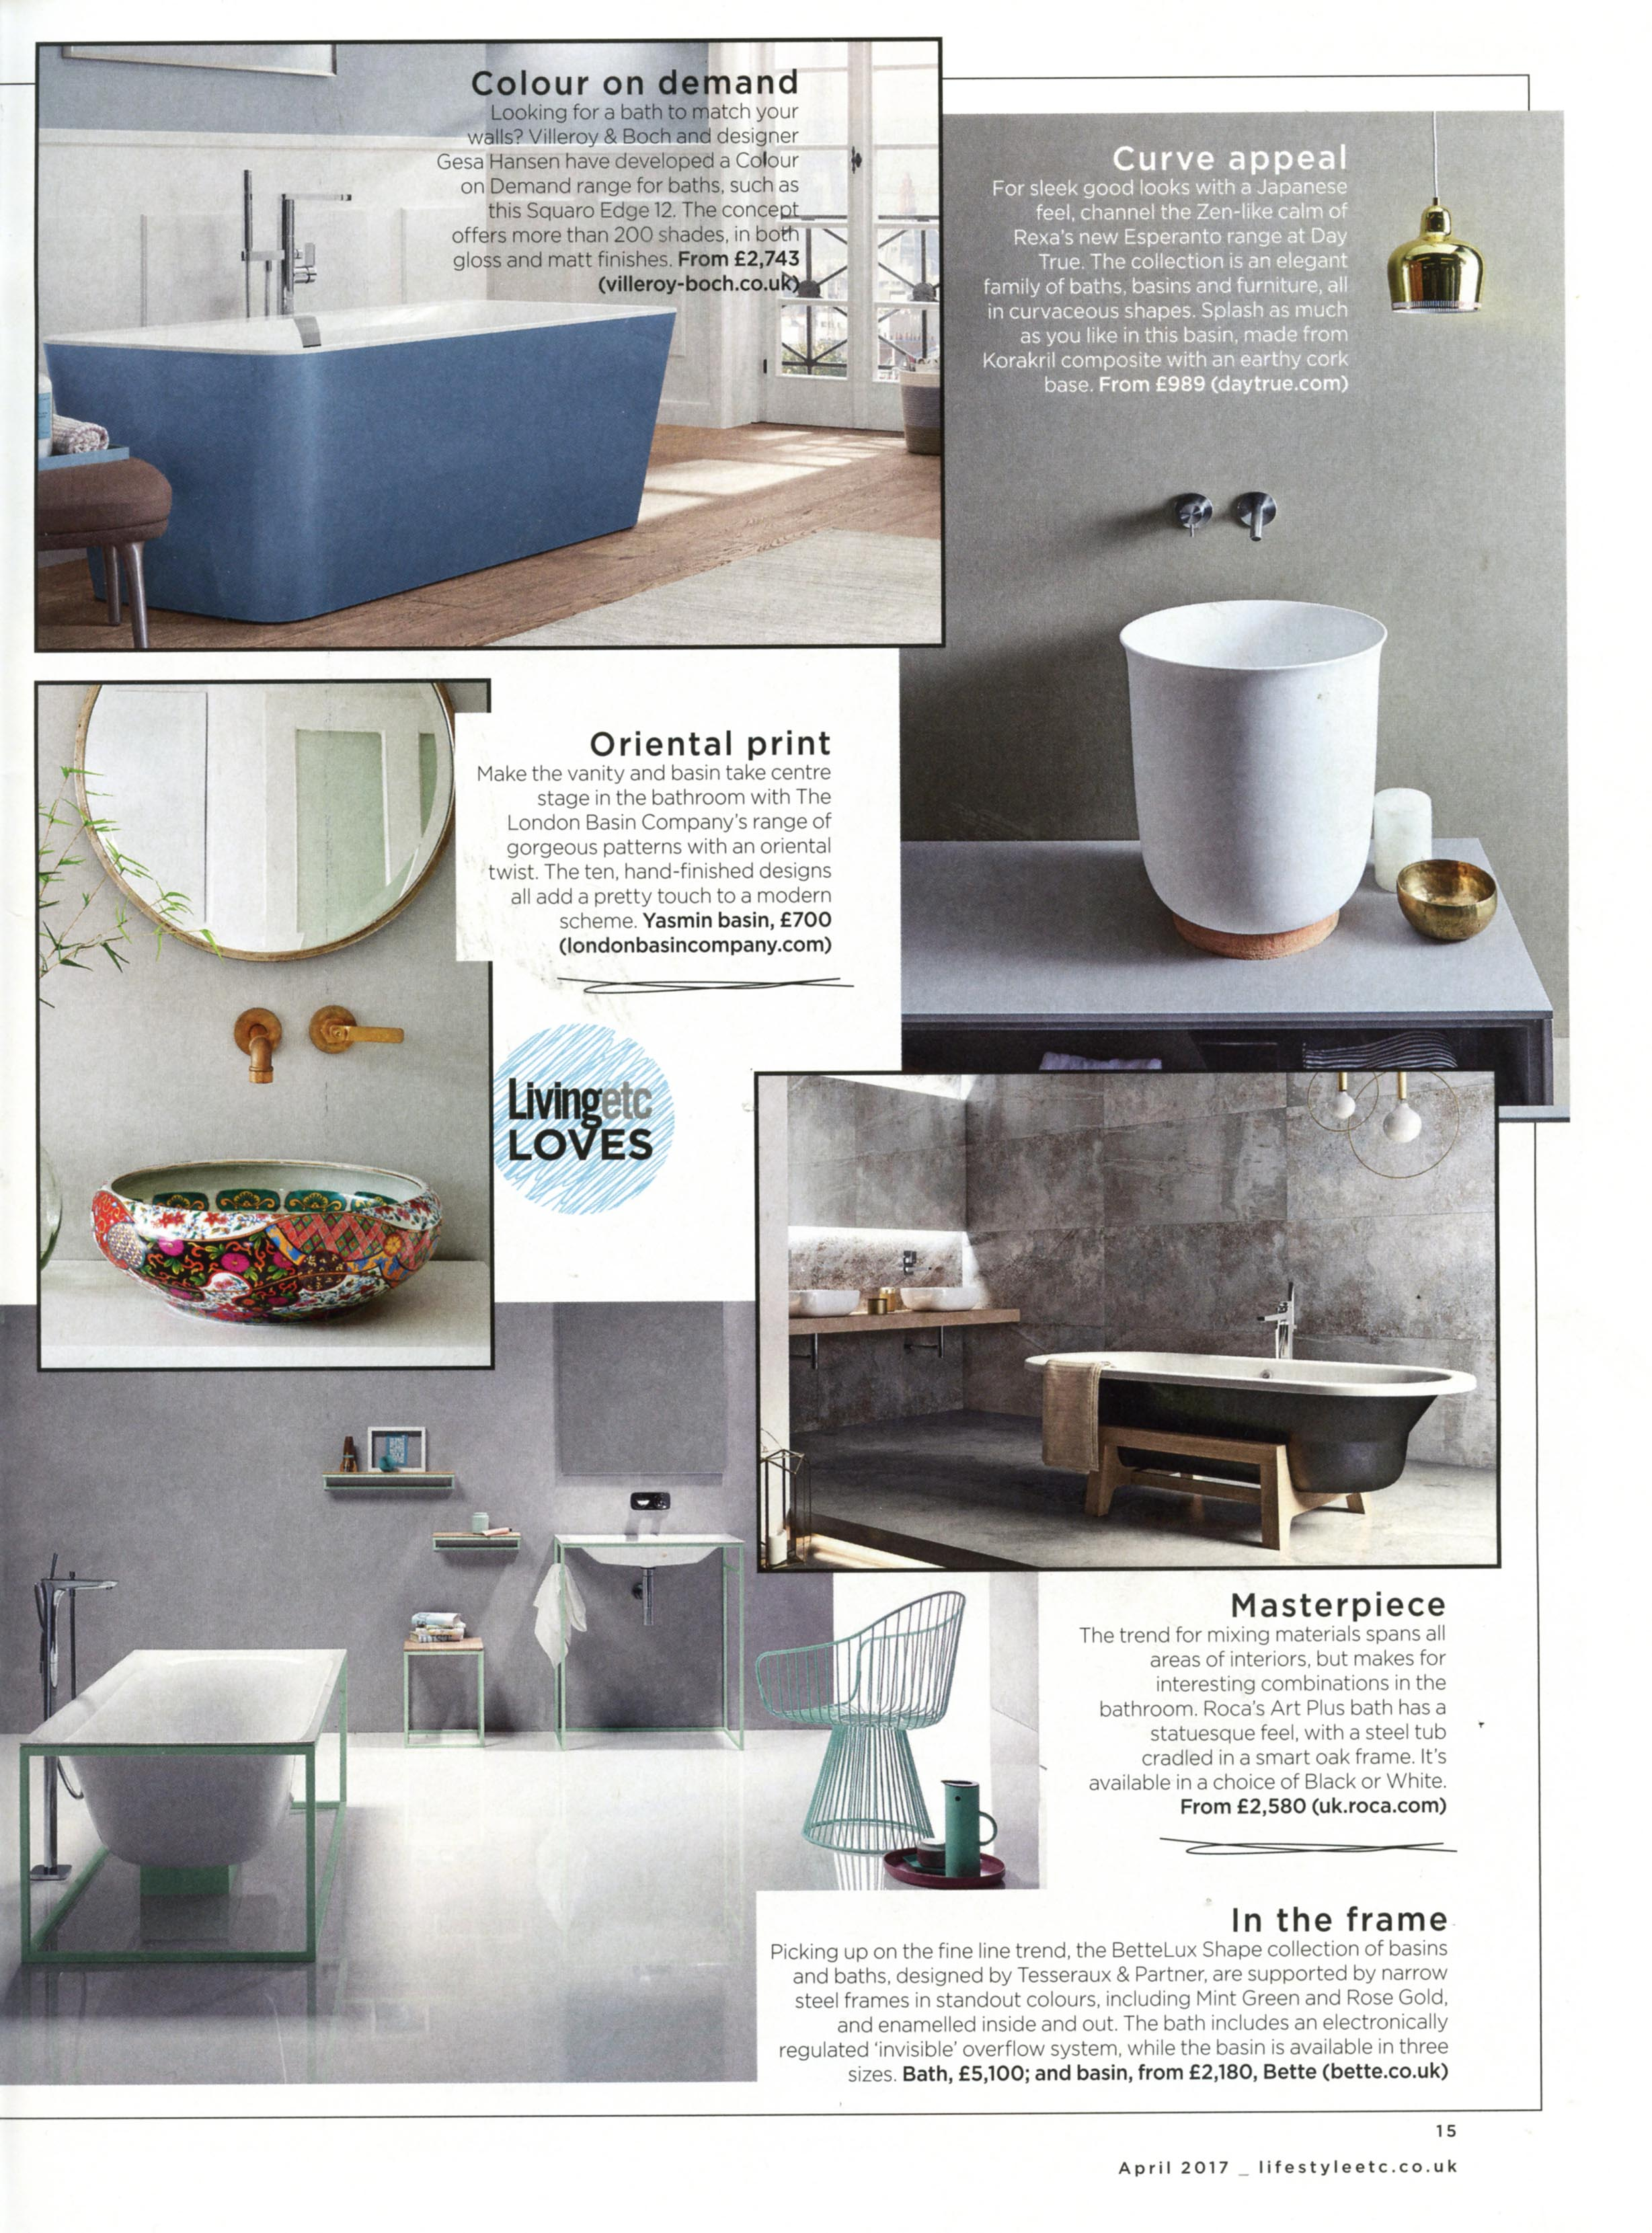 Living etc Bathroomsetc Supplement April 2017 LBC.jpg